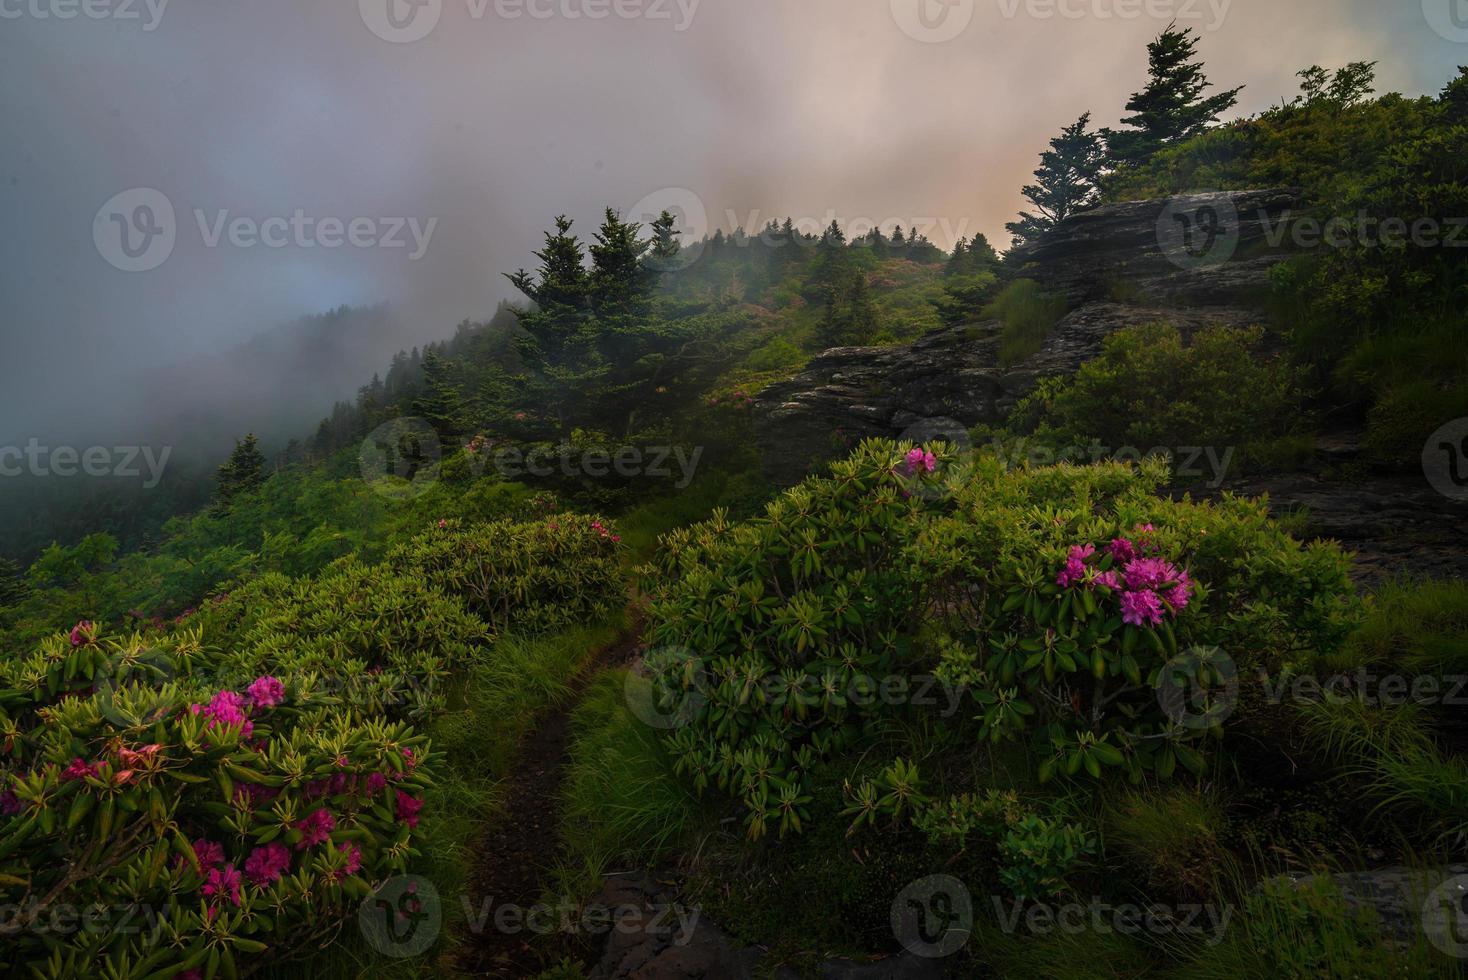 roan montagne printemps rhododenron fleurit photo